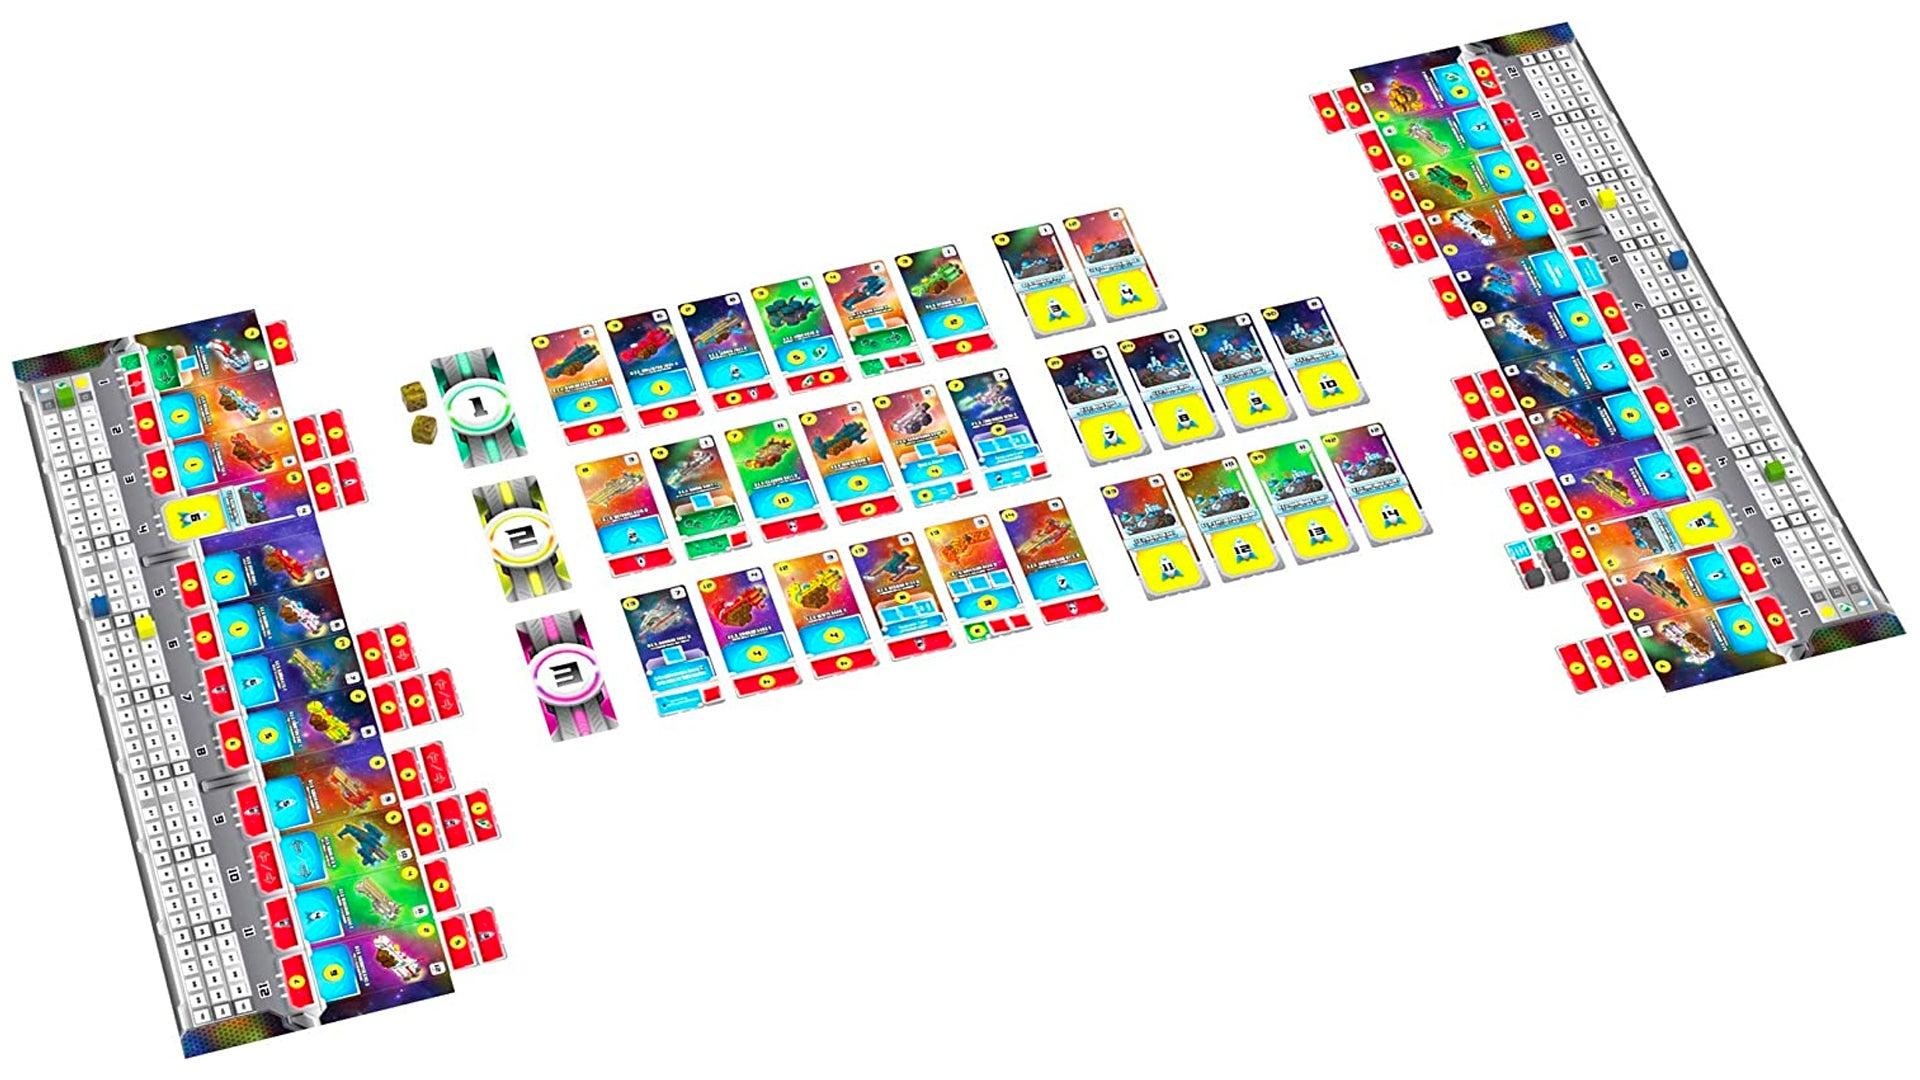 space-base-board-game-gameplay.jpg